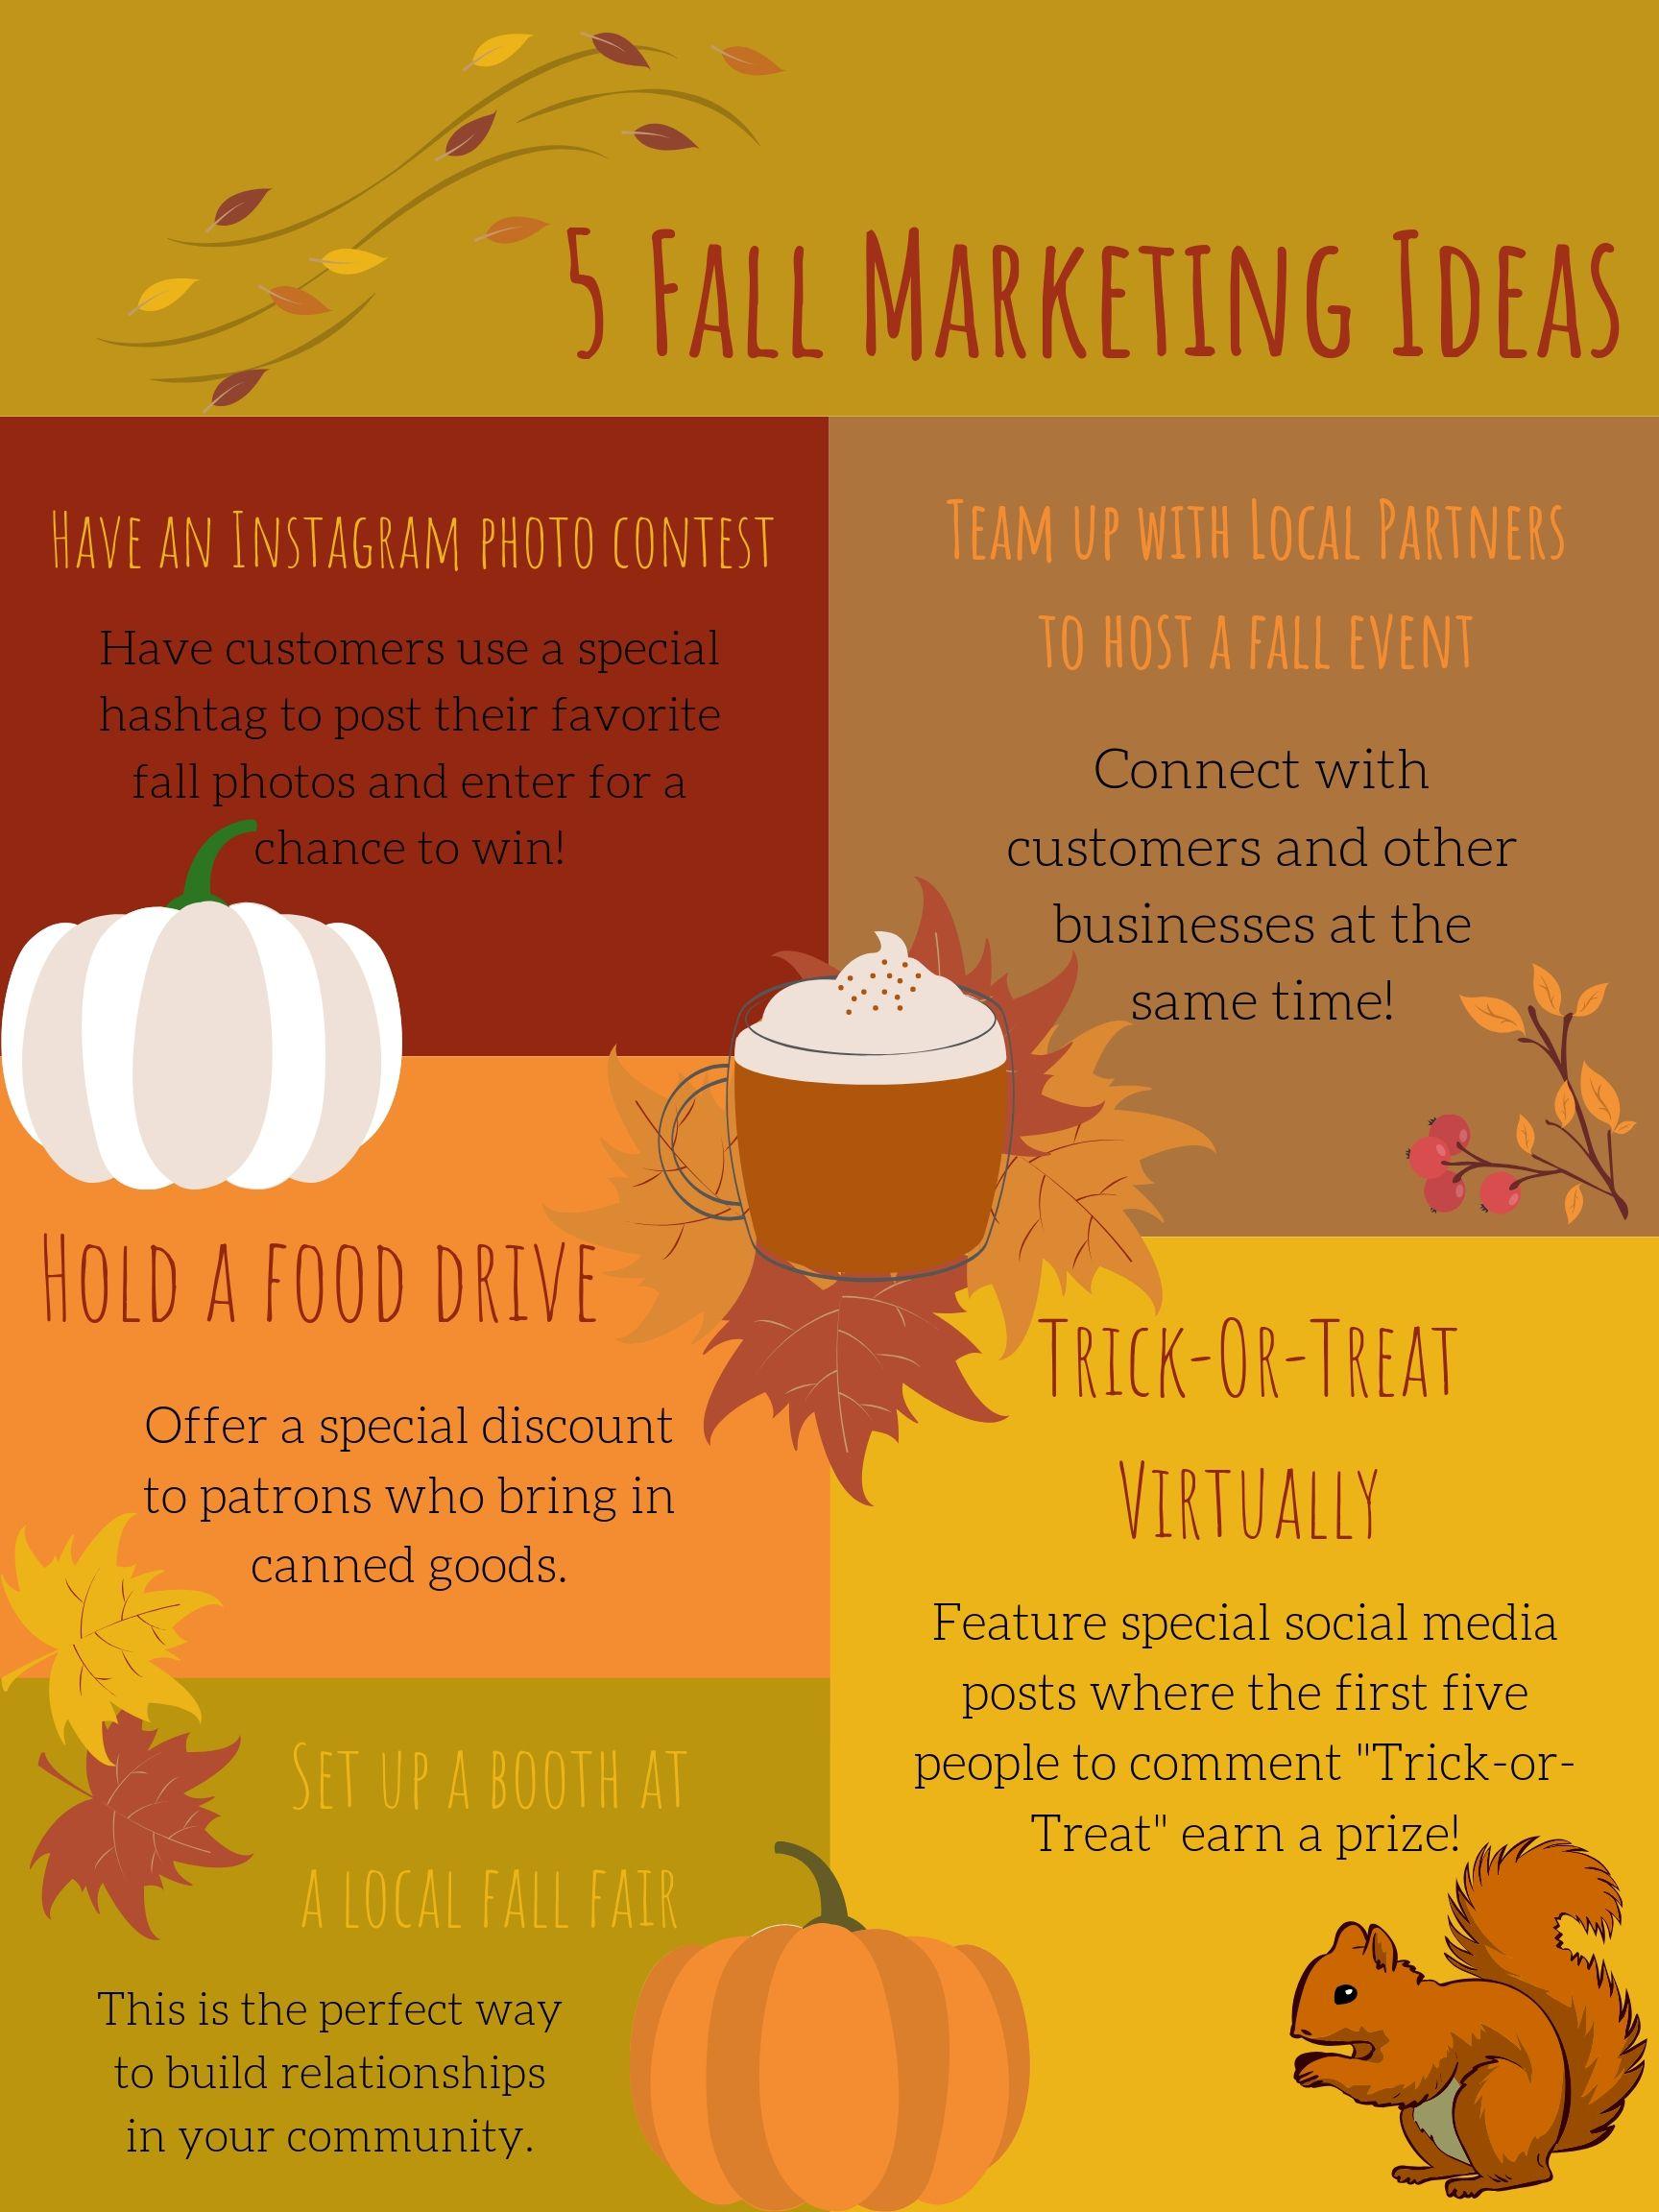 5 Fall Marketing Ideas infographic